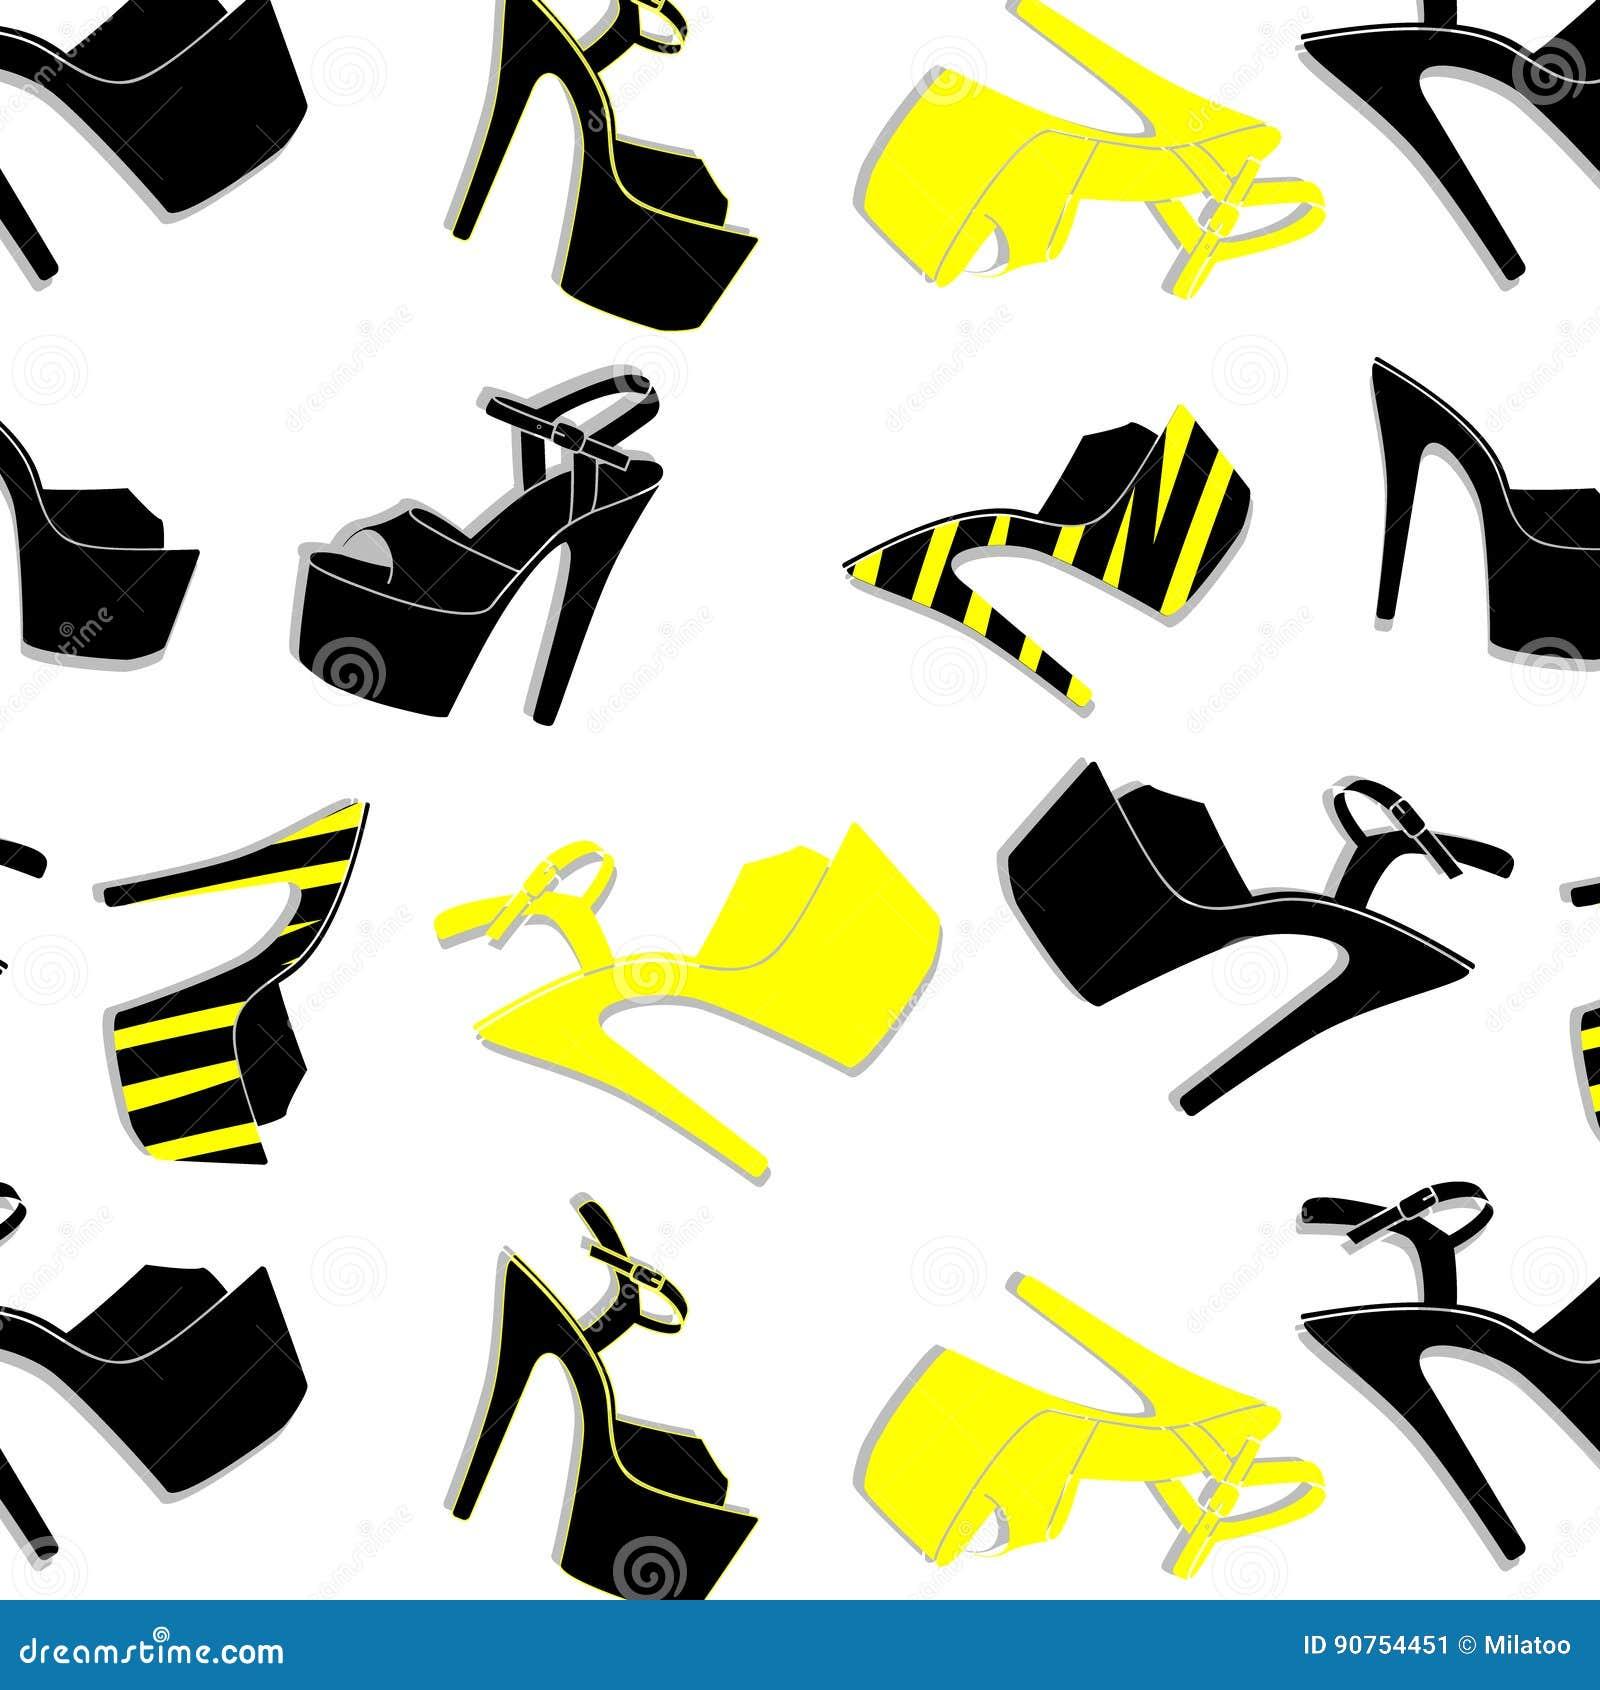 f6fffee796d Vector Pole Dance Shoes. High Heels Pattern For Striptease